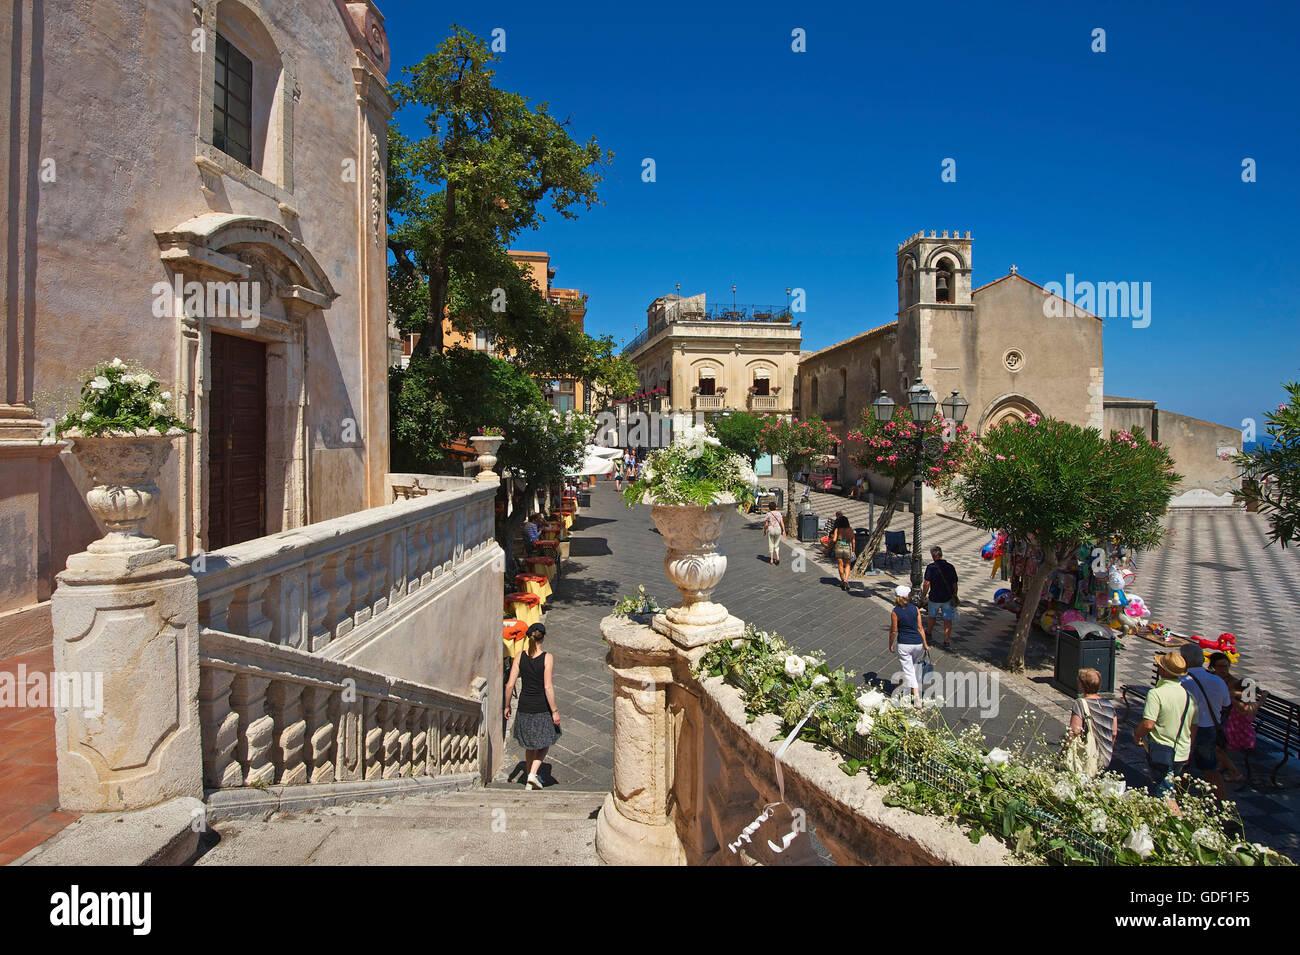 Blick auf die Piazza IX. Aprile, Taromina, Sizilien, Italien - Stock Image